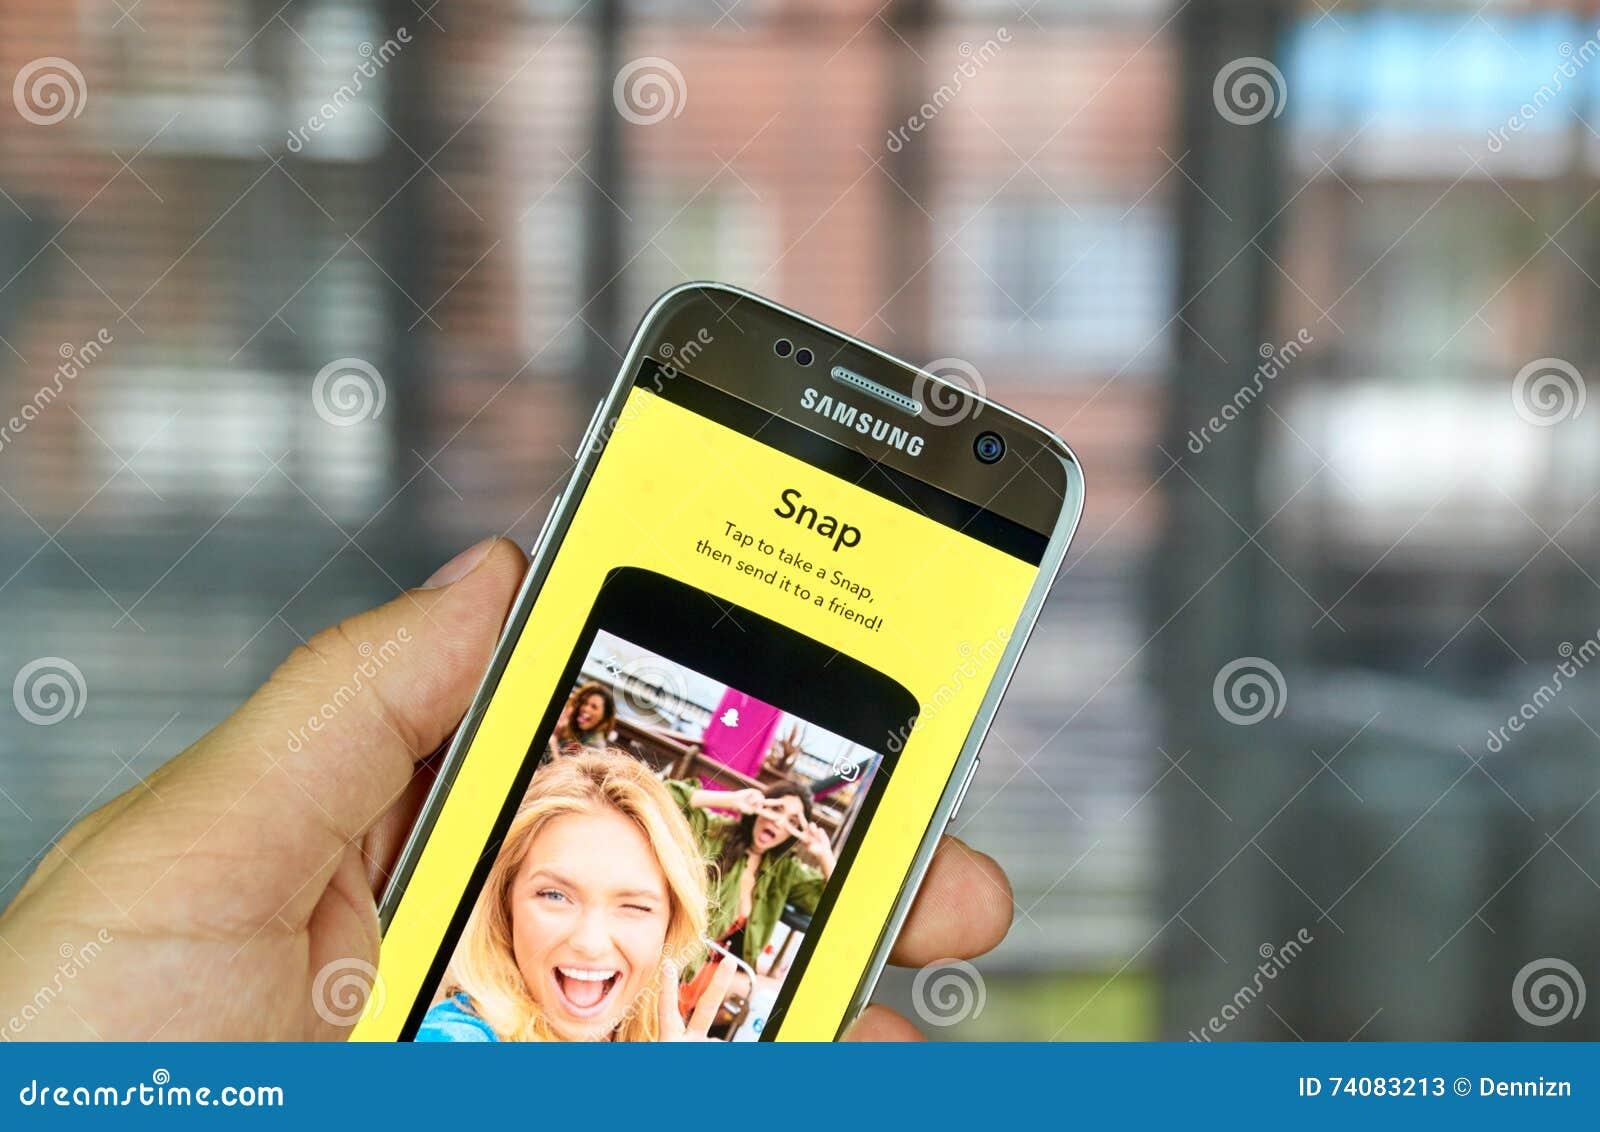 Download snap shot for mobile